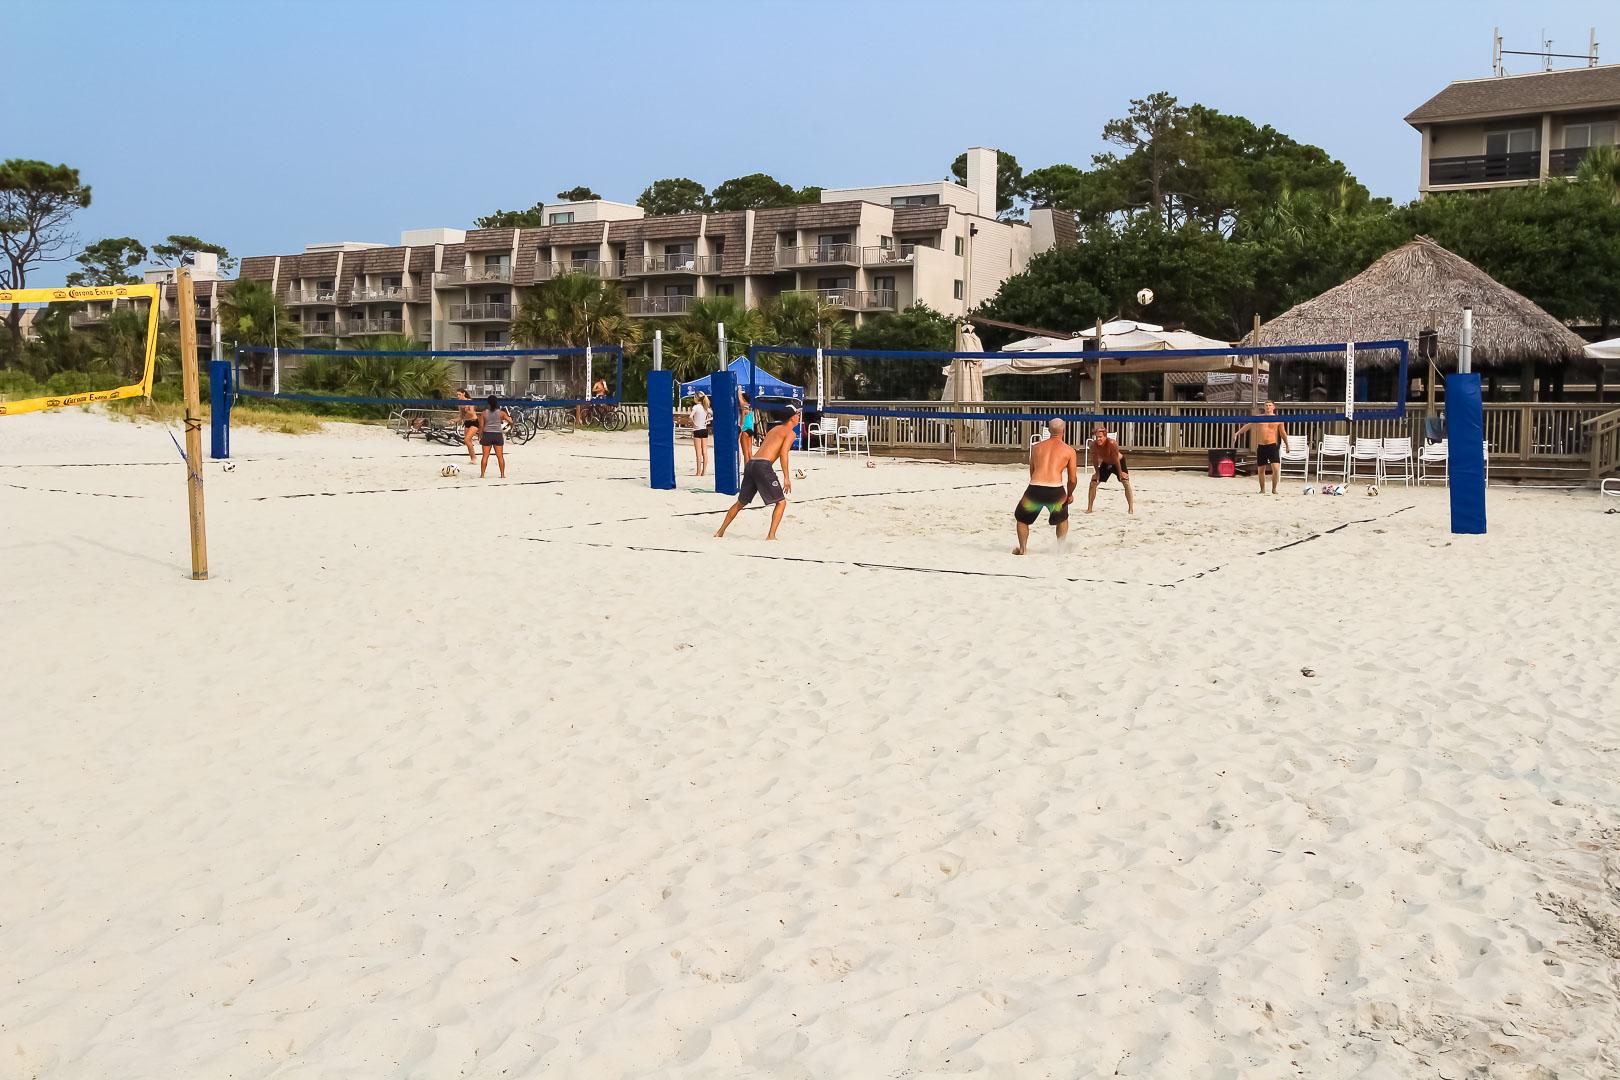 A beach view from VRI's Players Club Resort in Hilton Head Island, South Carolina.